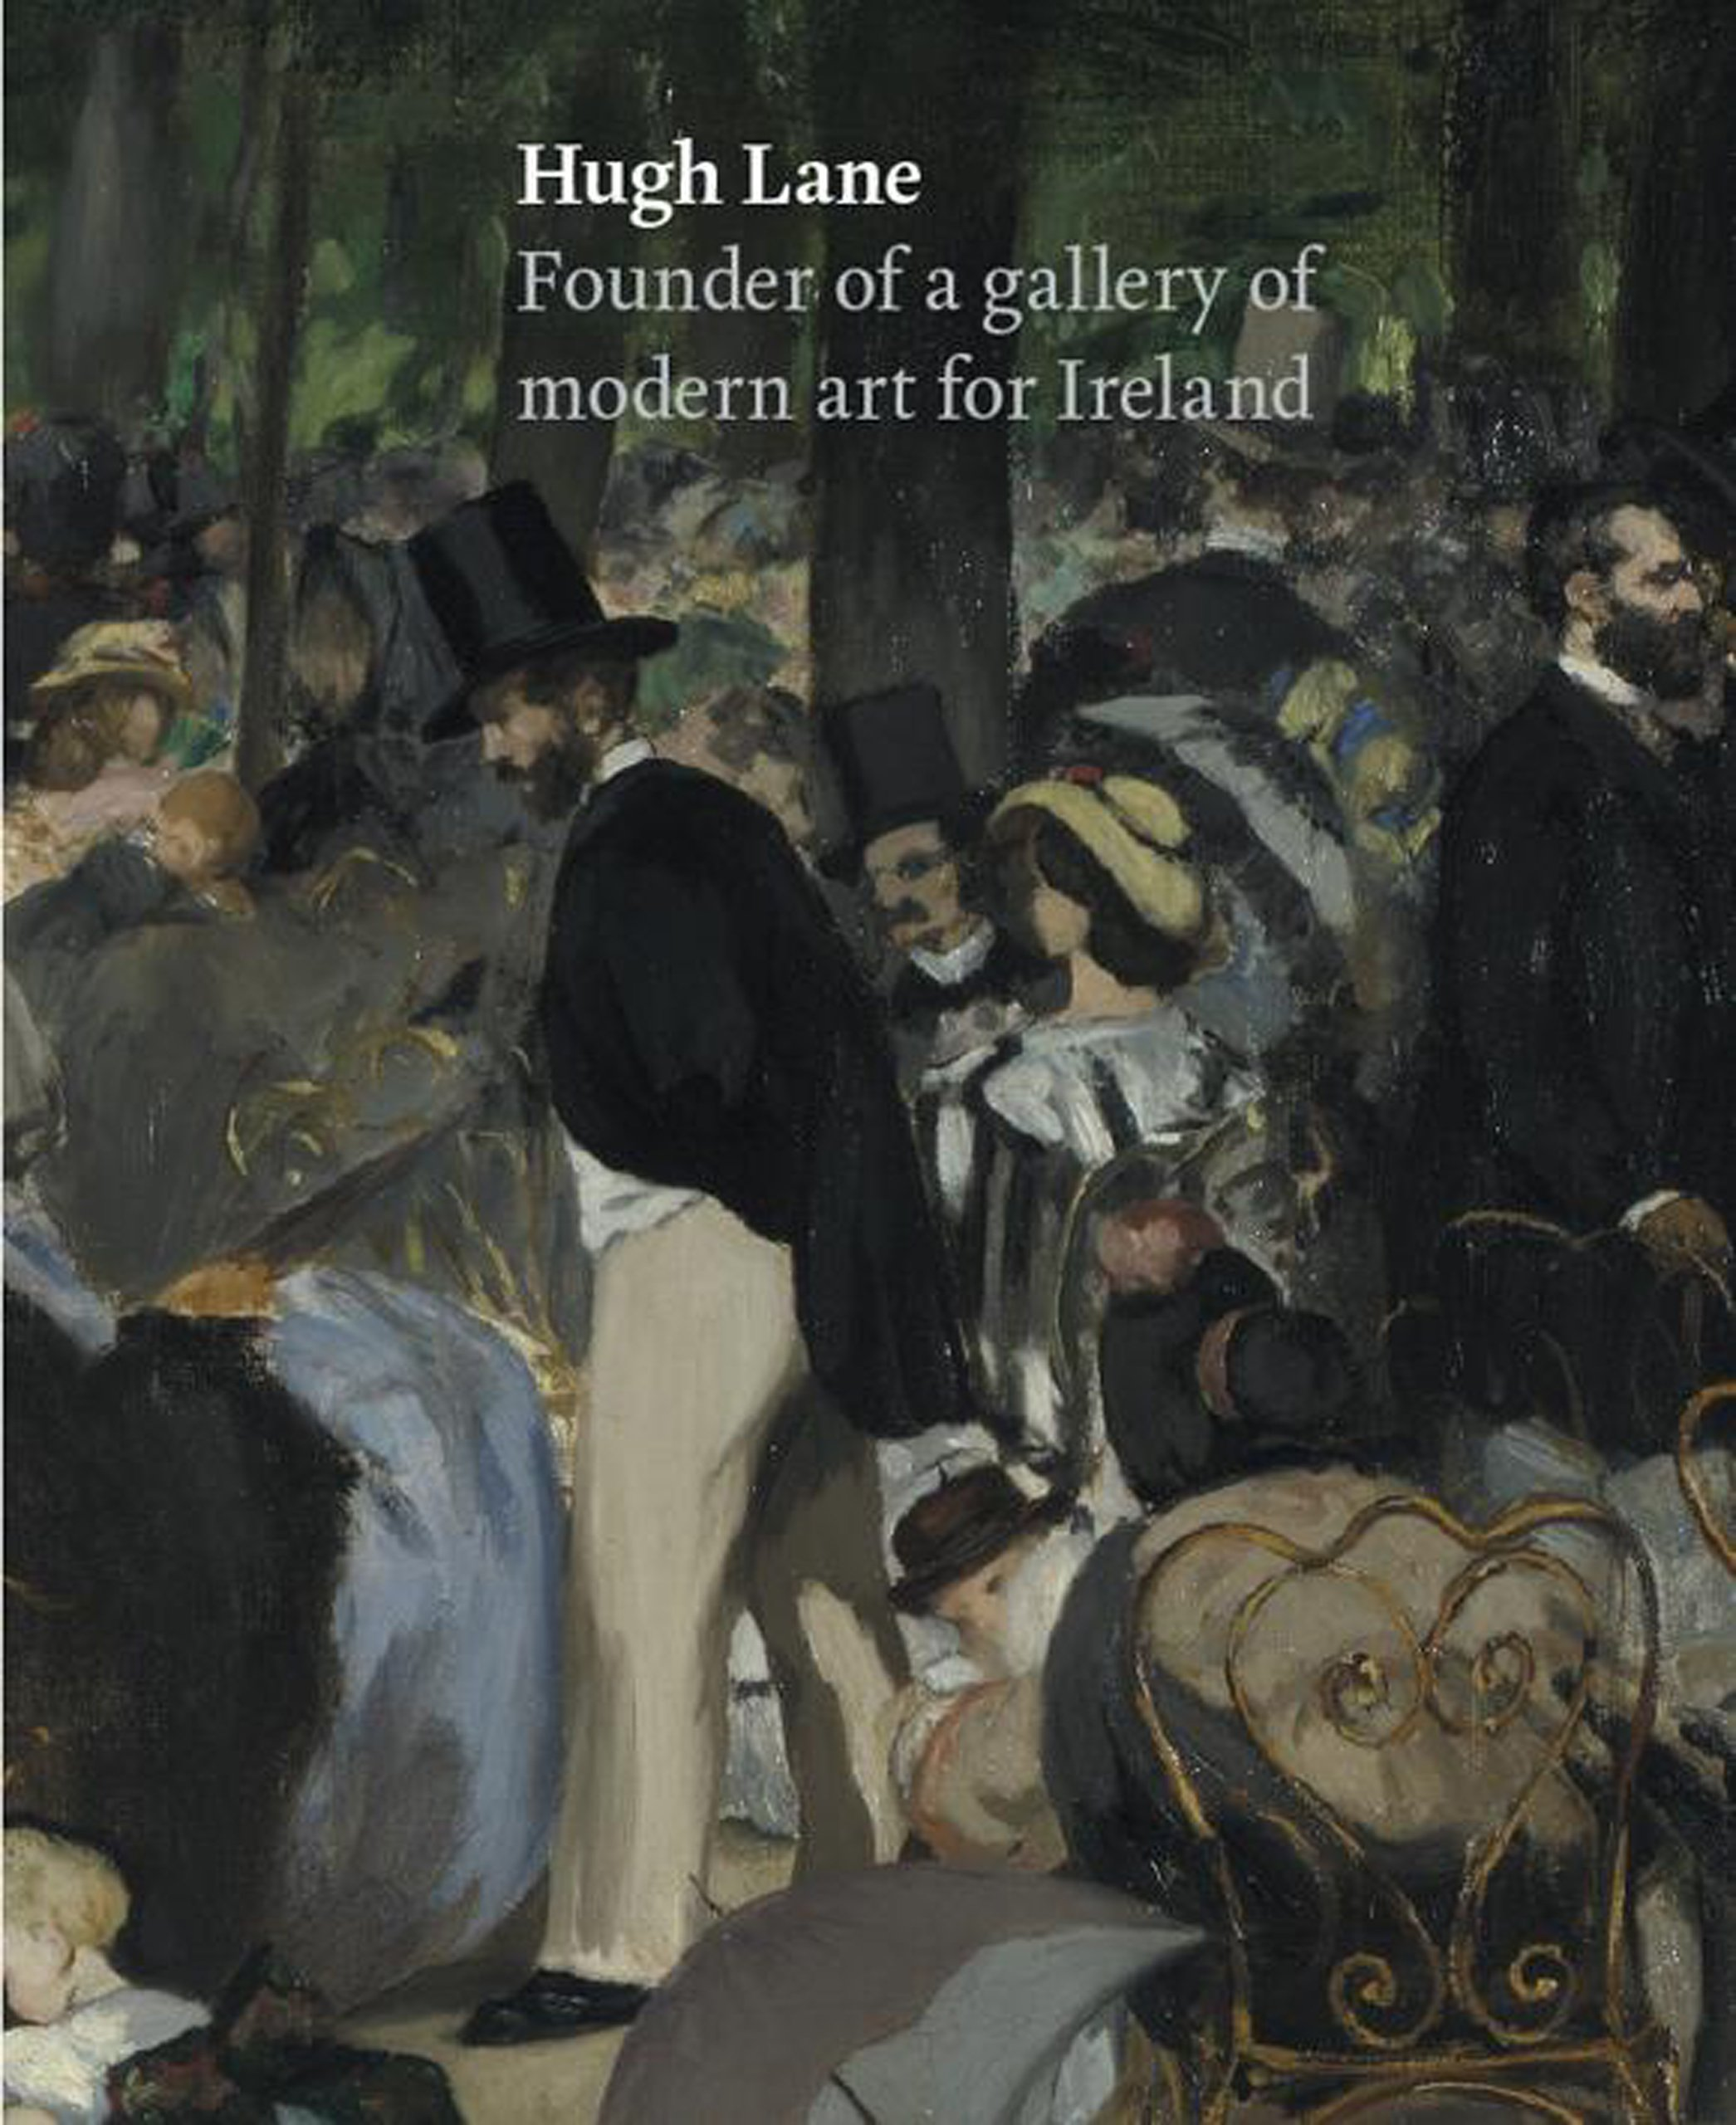 Hugh Lane: Founder of a Gallery of Modern Art for Ireland